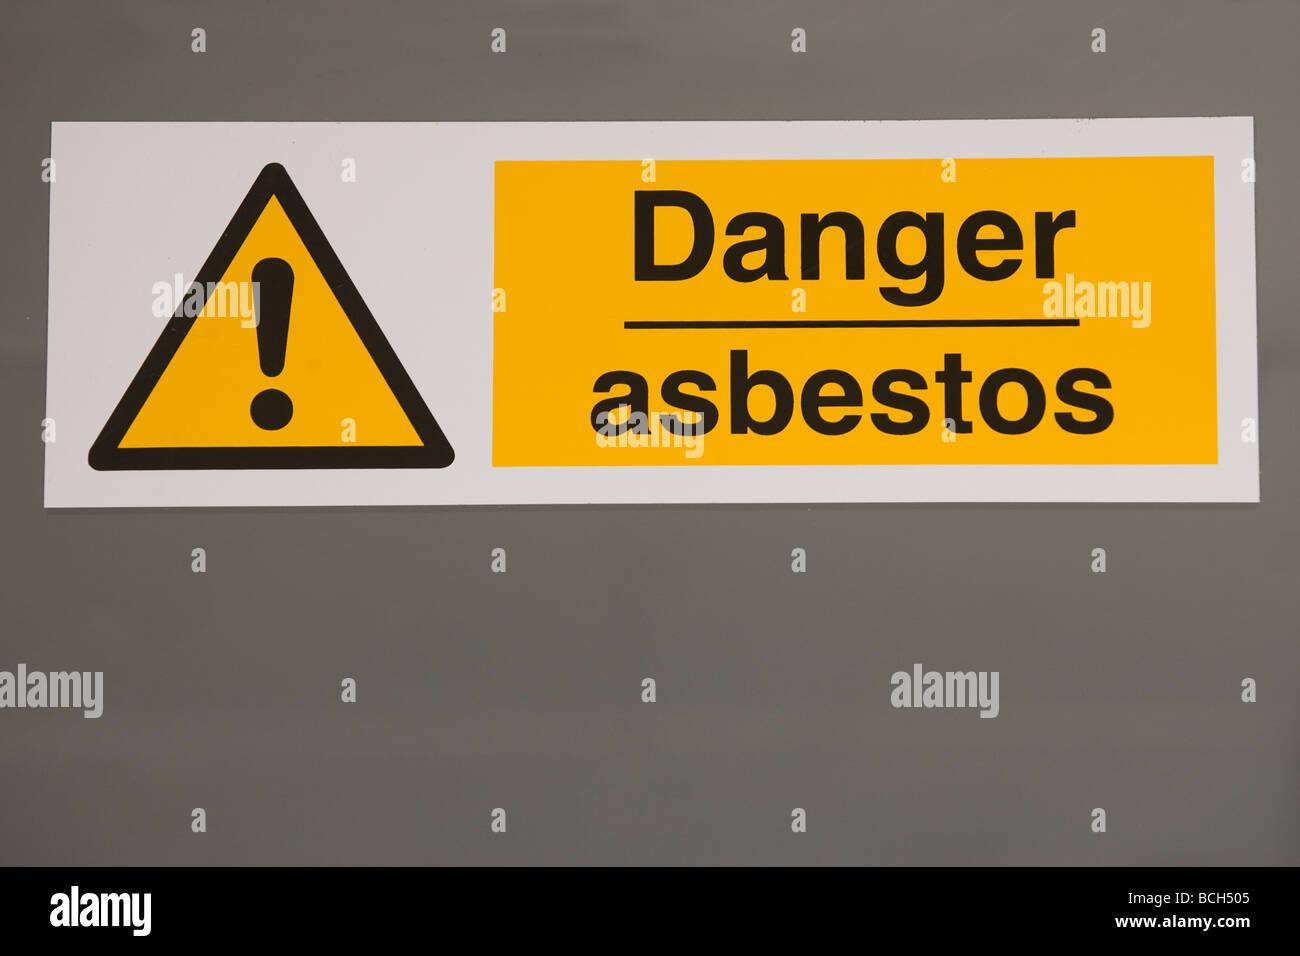 Asbestos Warning Sign - Stock Image